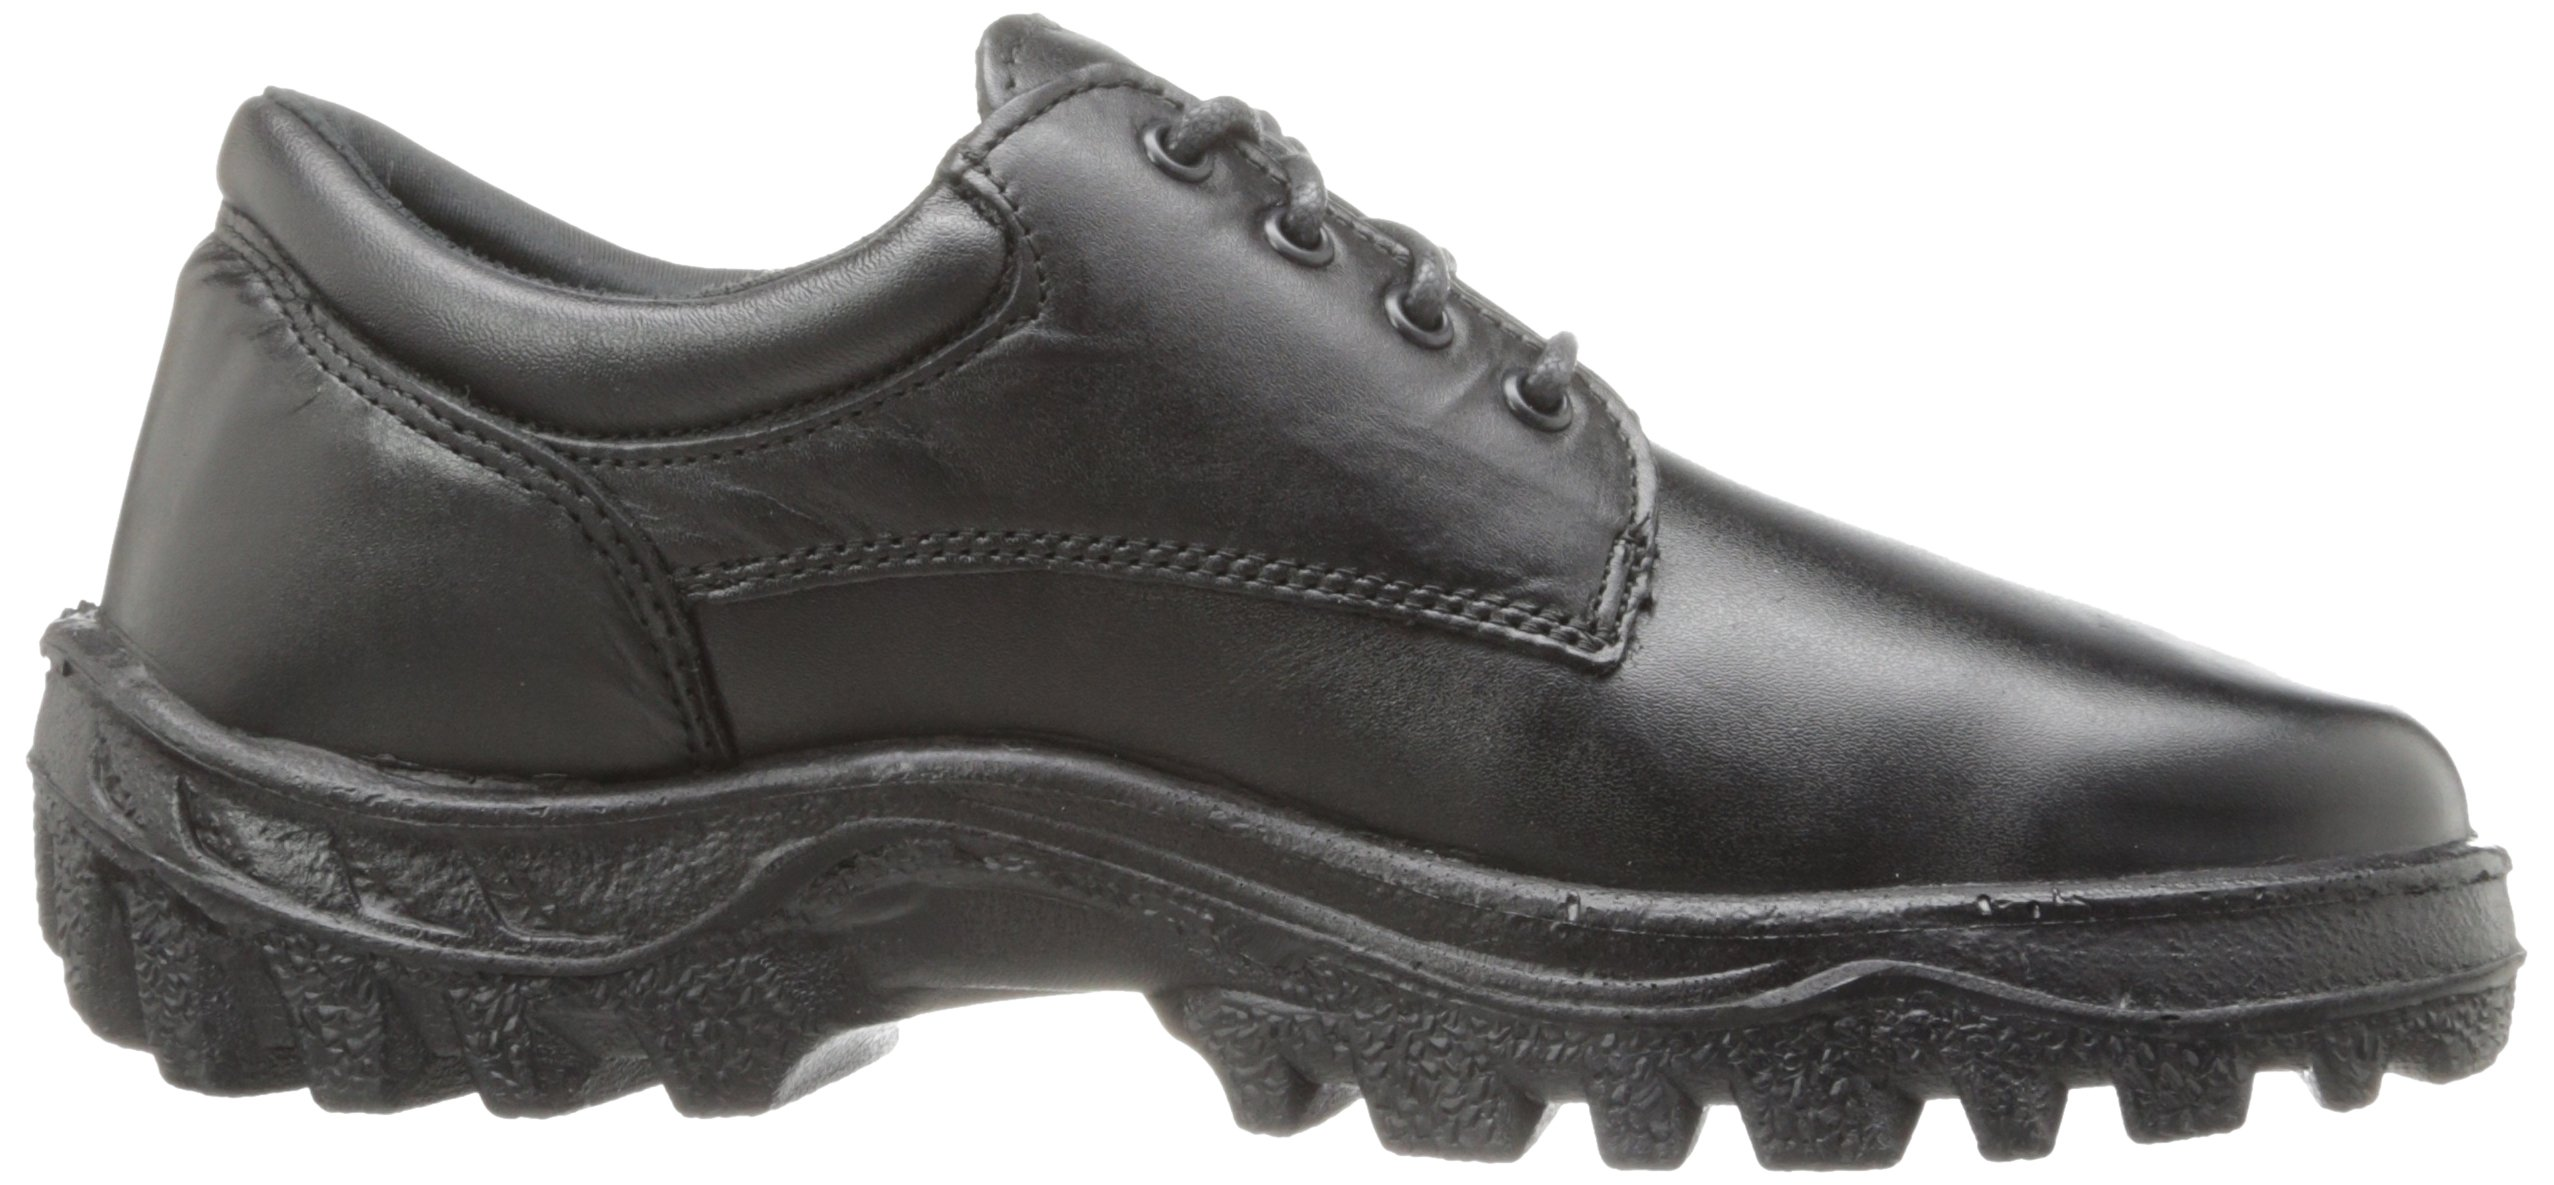 Rocky Men's Postal TMC Oxford Work Boot,Black,11.5 M US by Rocky (Image #6)